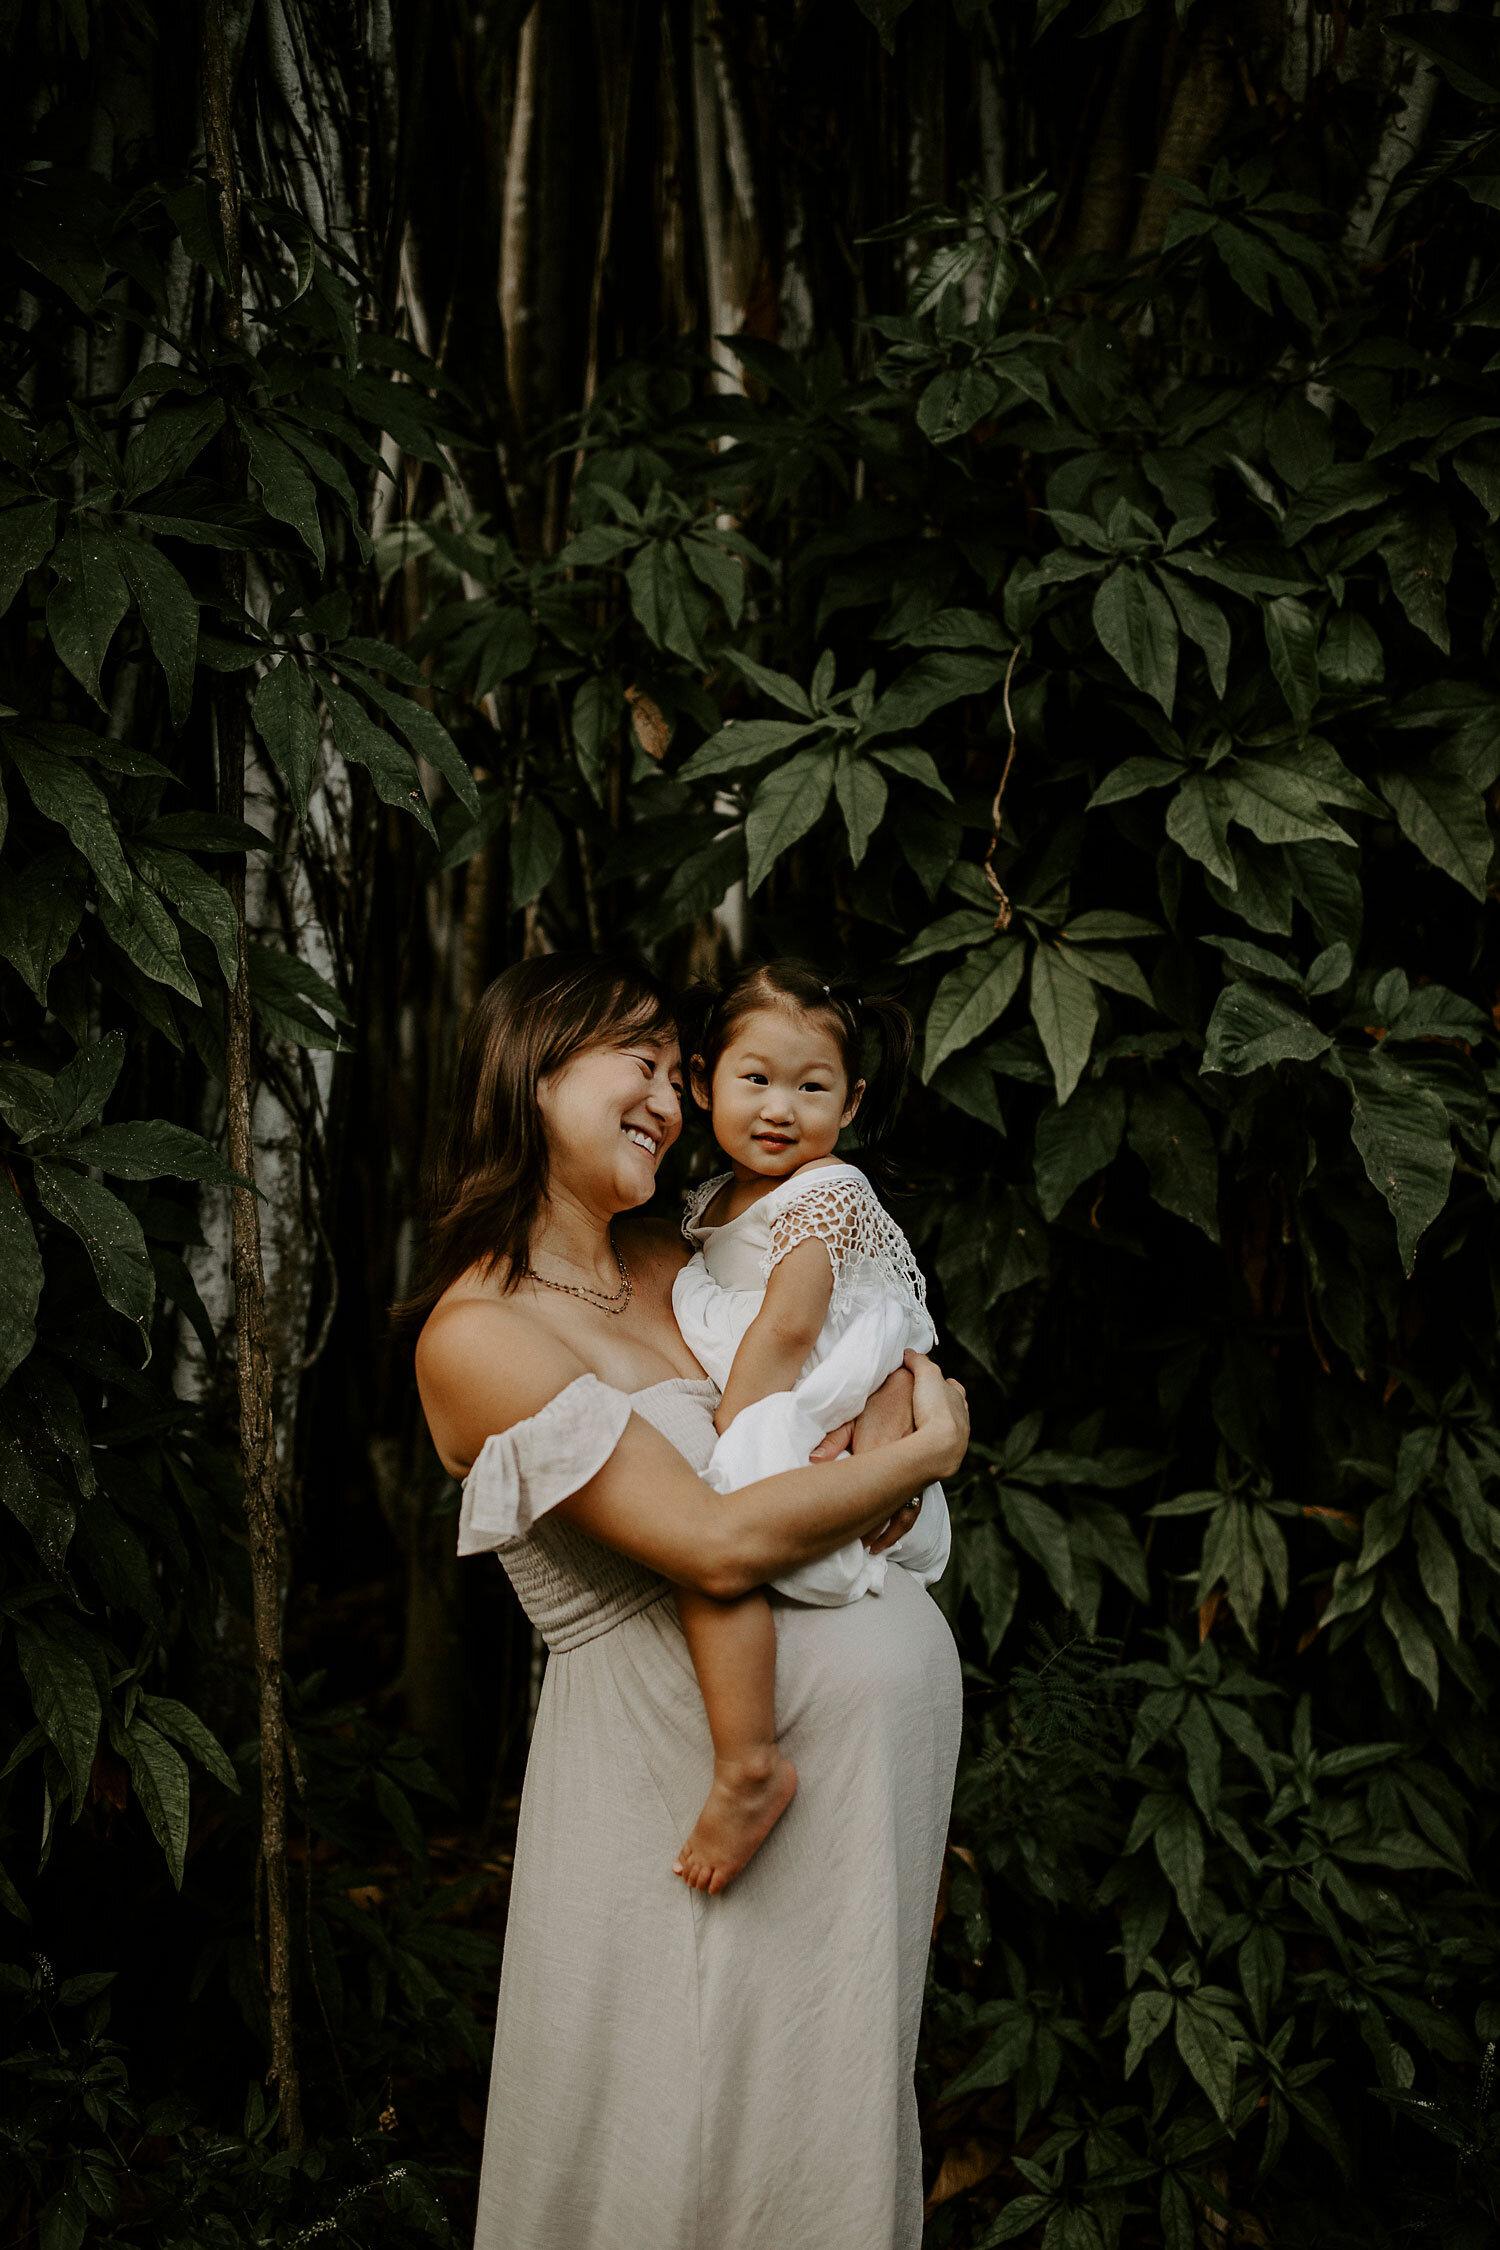 Oahu-Hawaii-North-Shore-Maternity-Photography-The-Sophia-Co-03.jpg